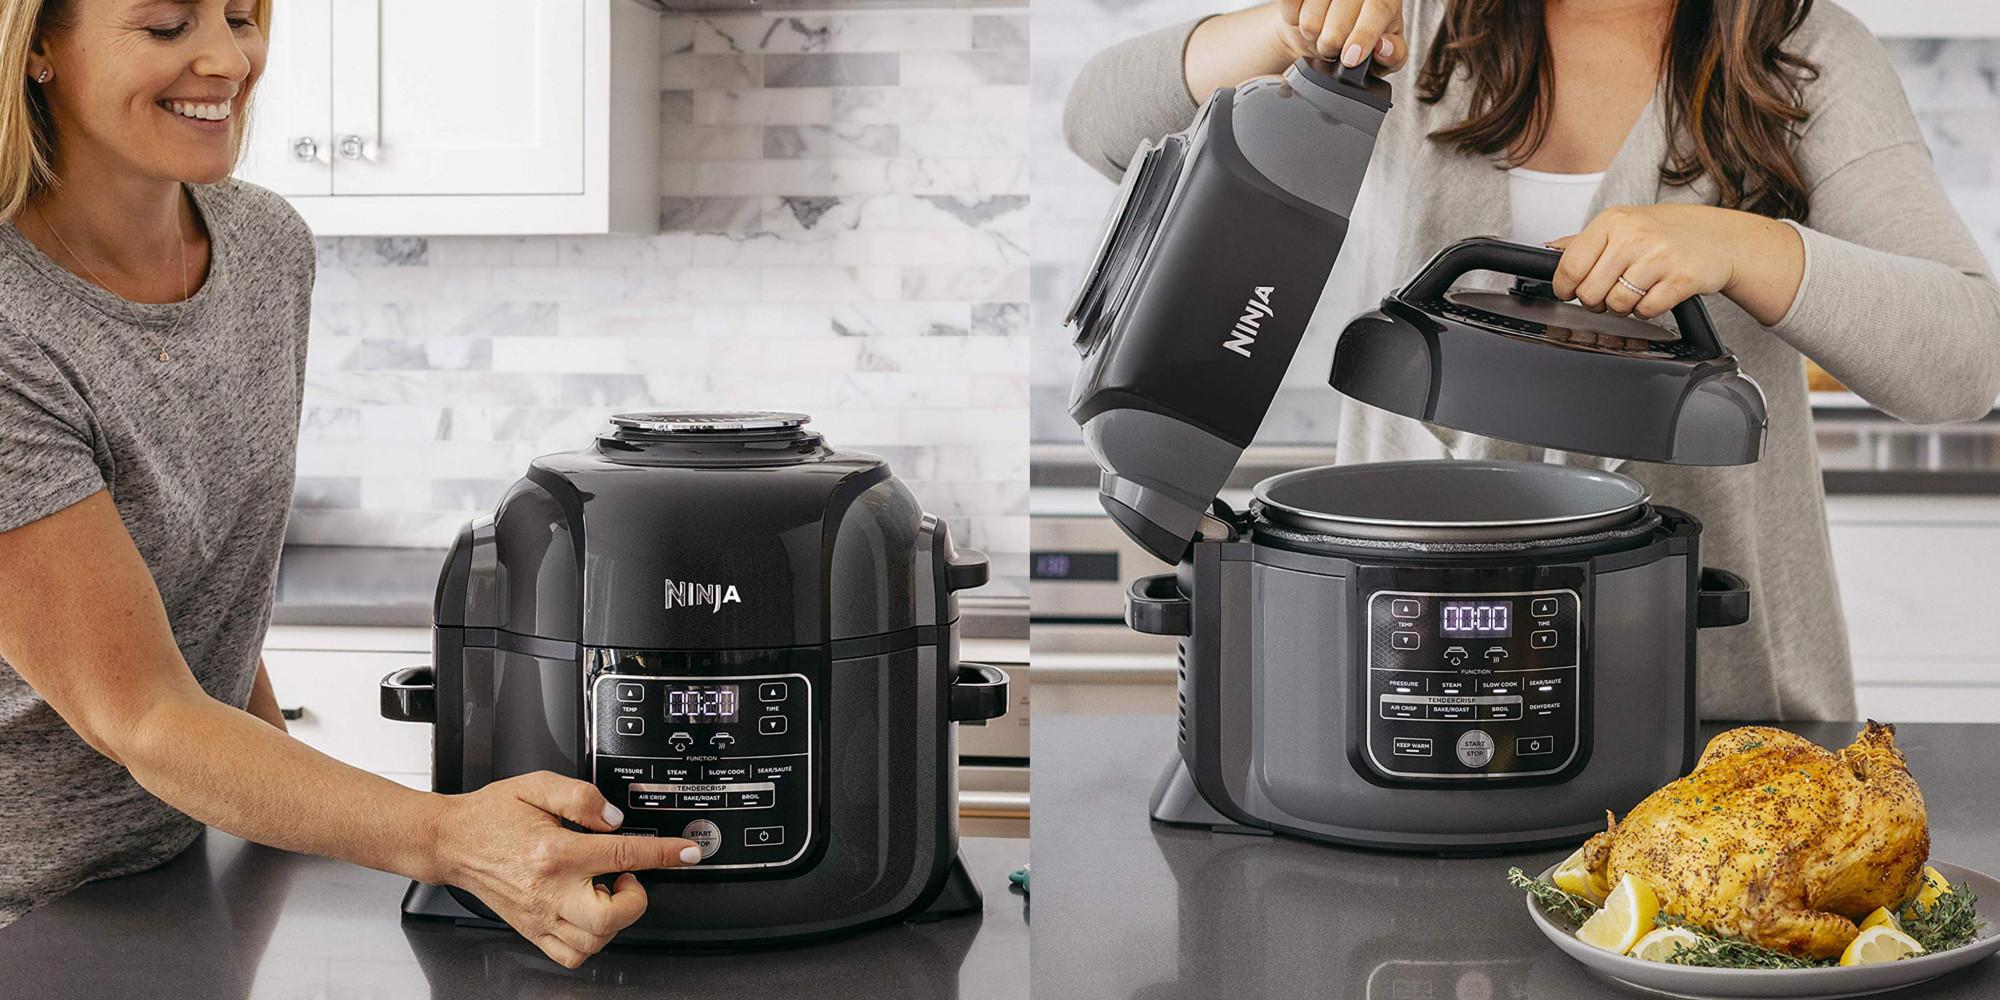 Ninja S Family Sized Foodi Multi Cooker Air Fryer Hits Amazon Low